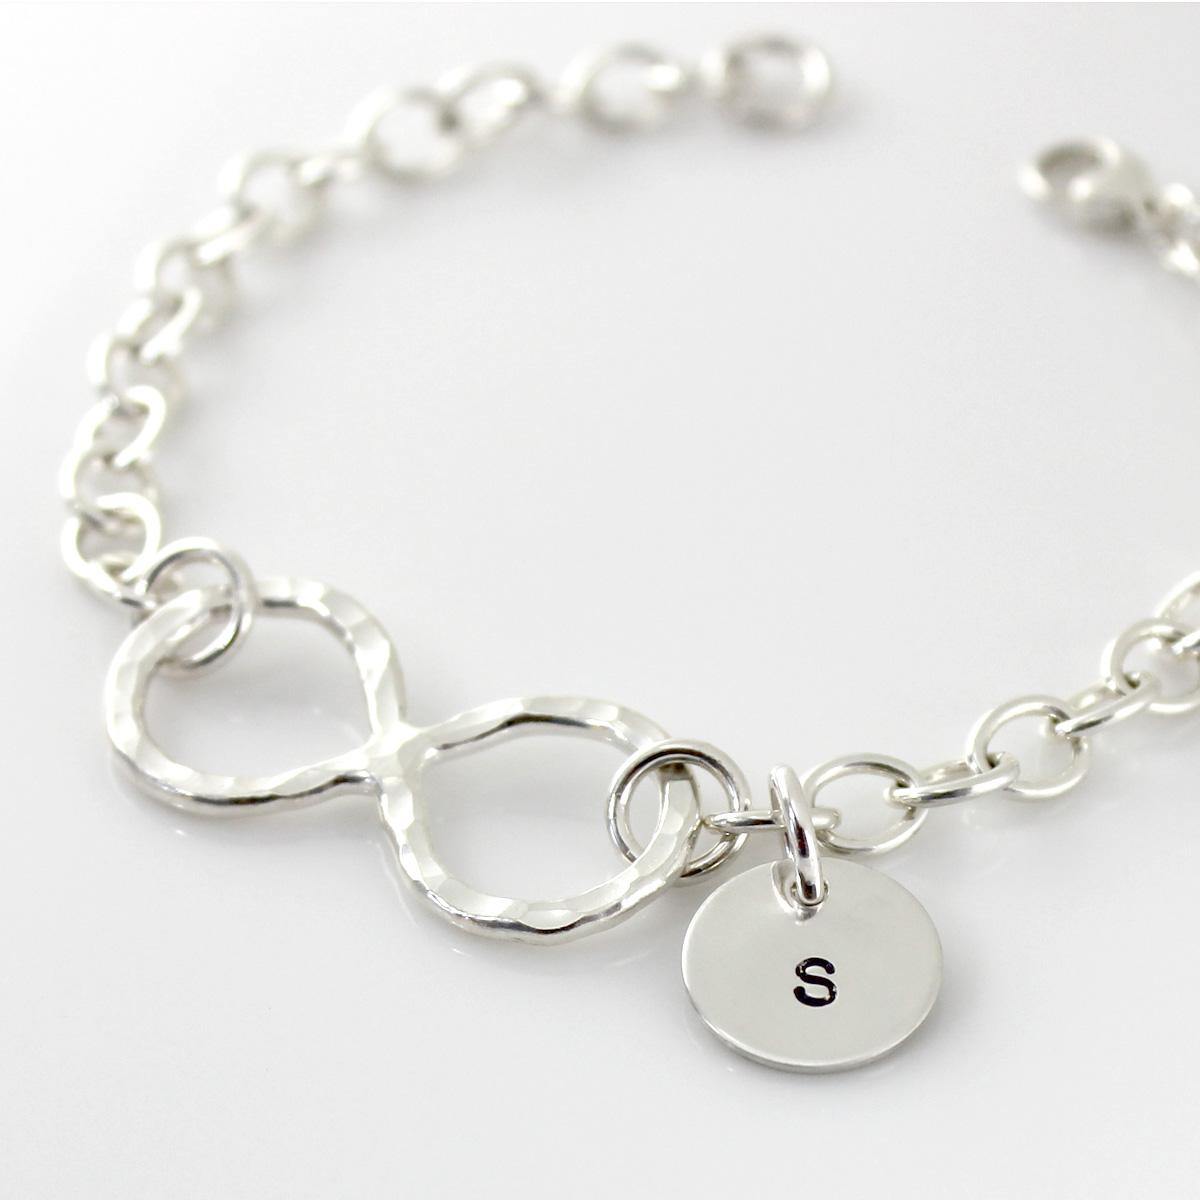 Infinity Symbol Bracelet with initial charm